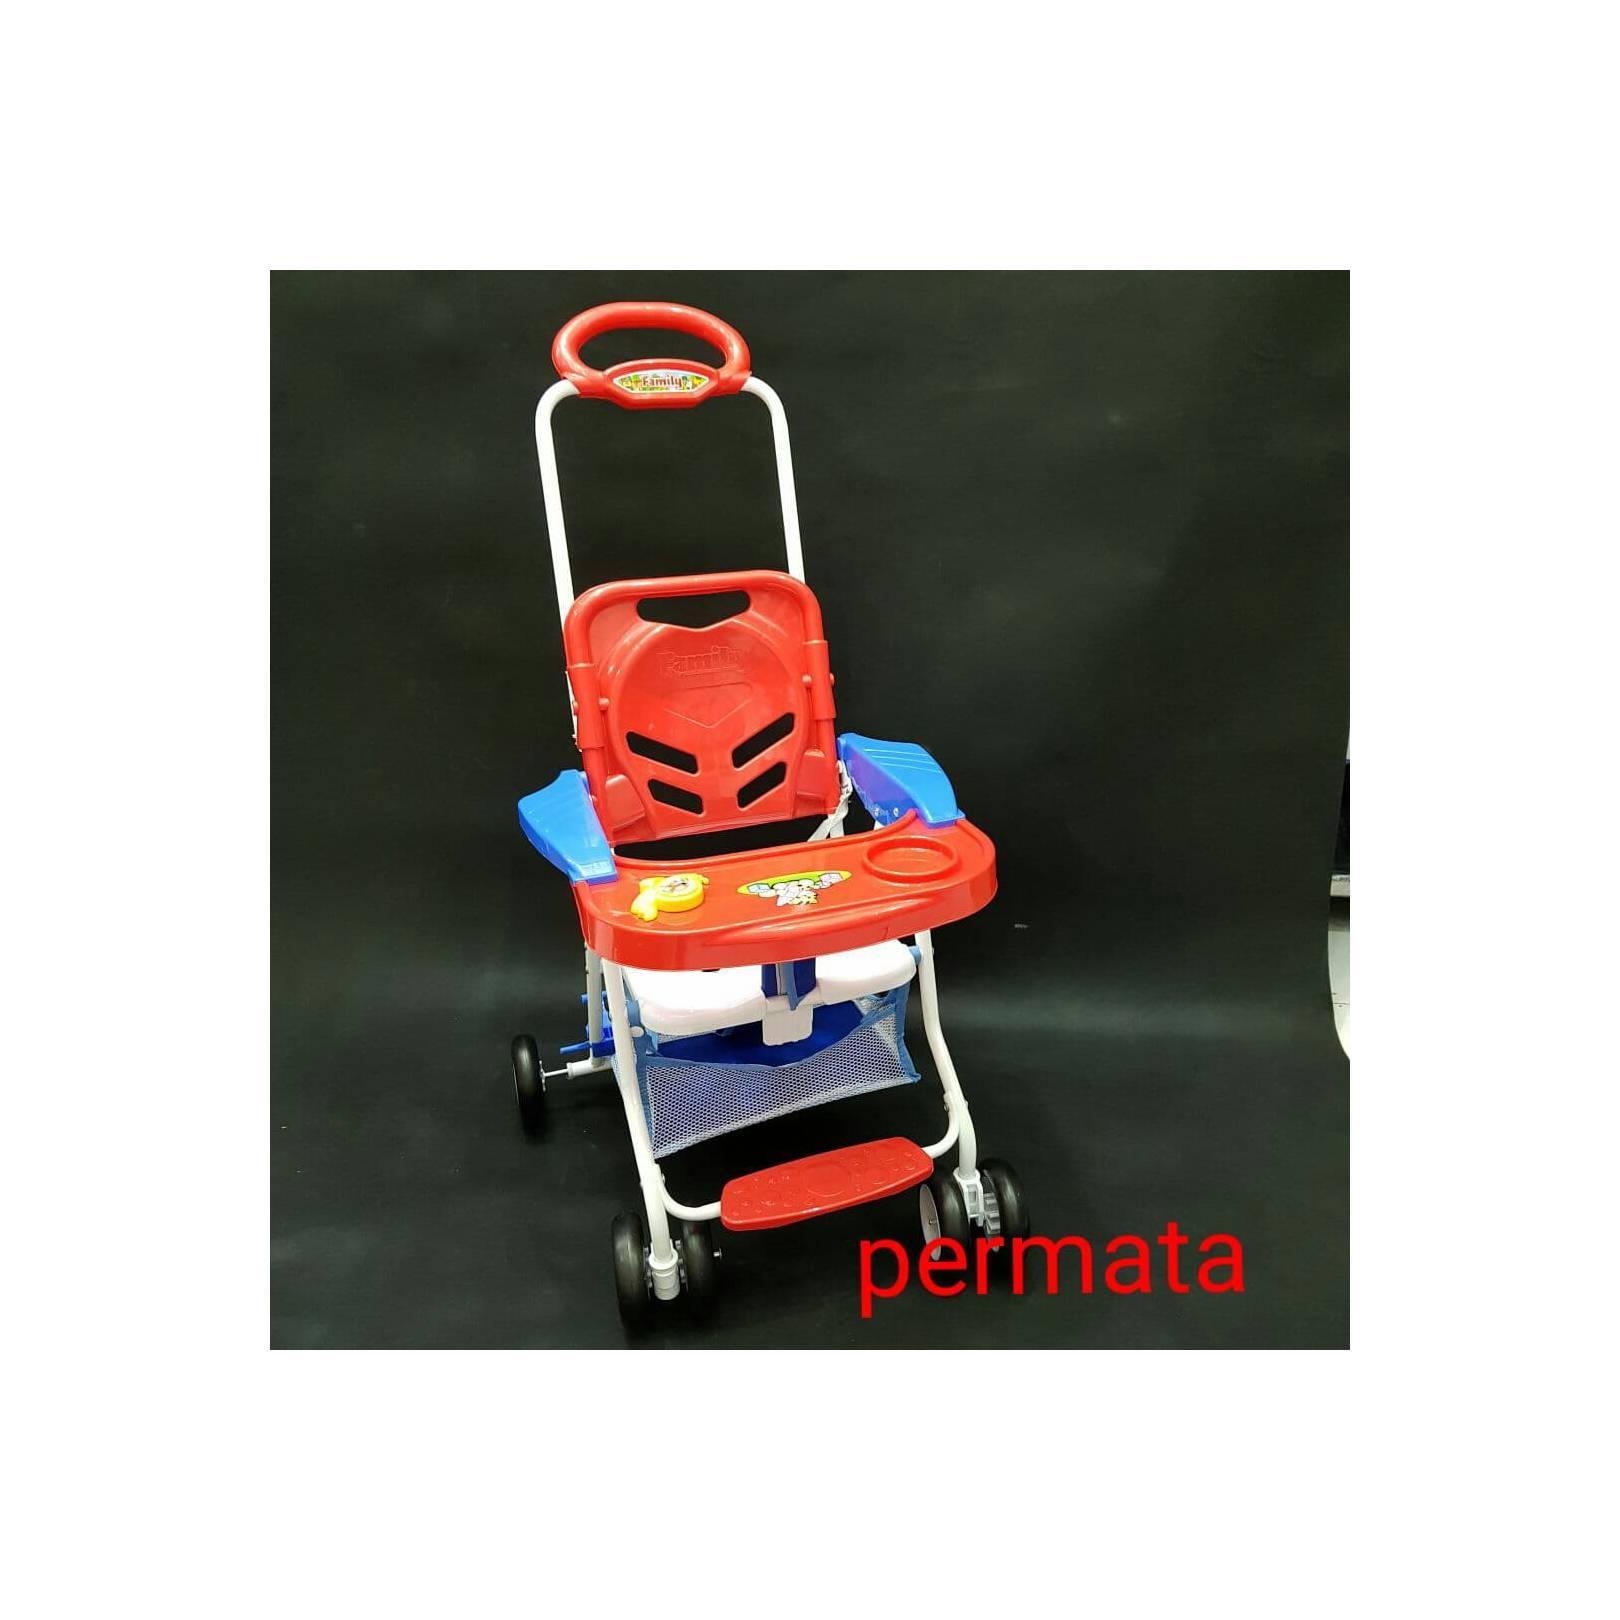 Kursi Tempat makan BAYI/ chair baby walker FAMILY CHAIR